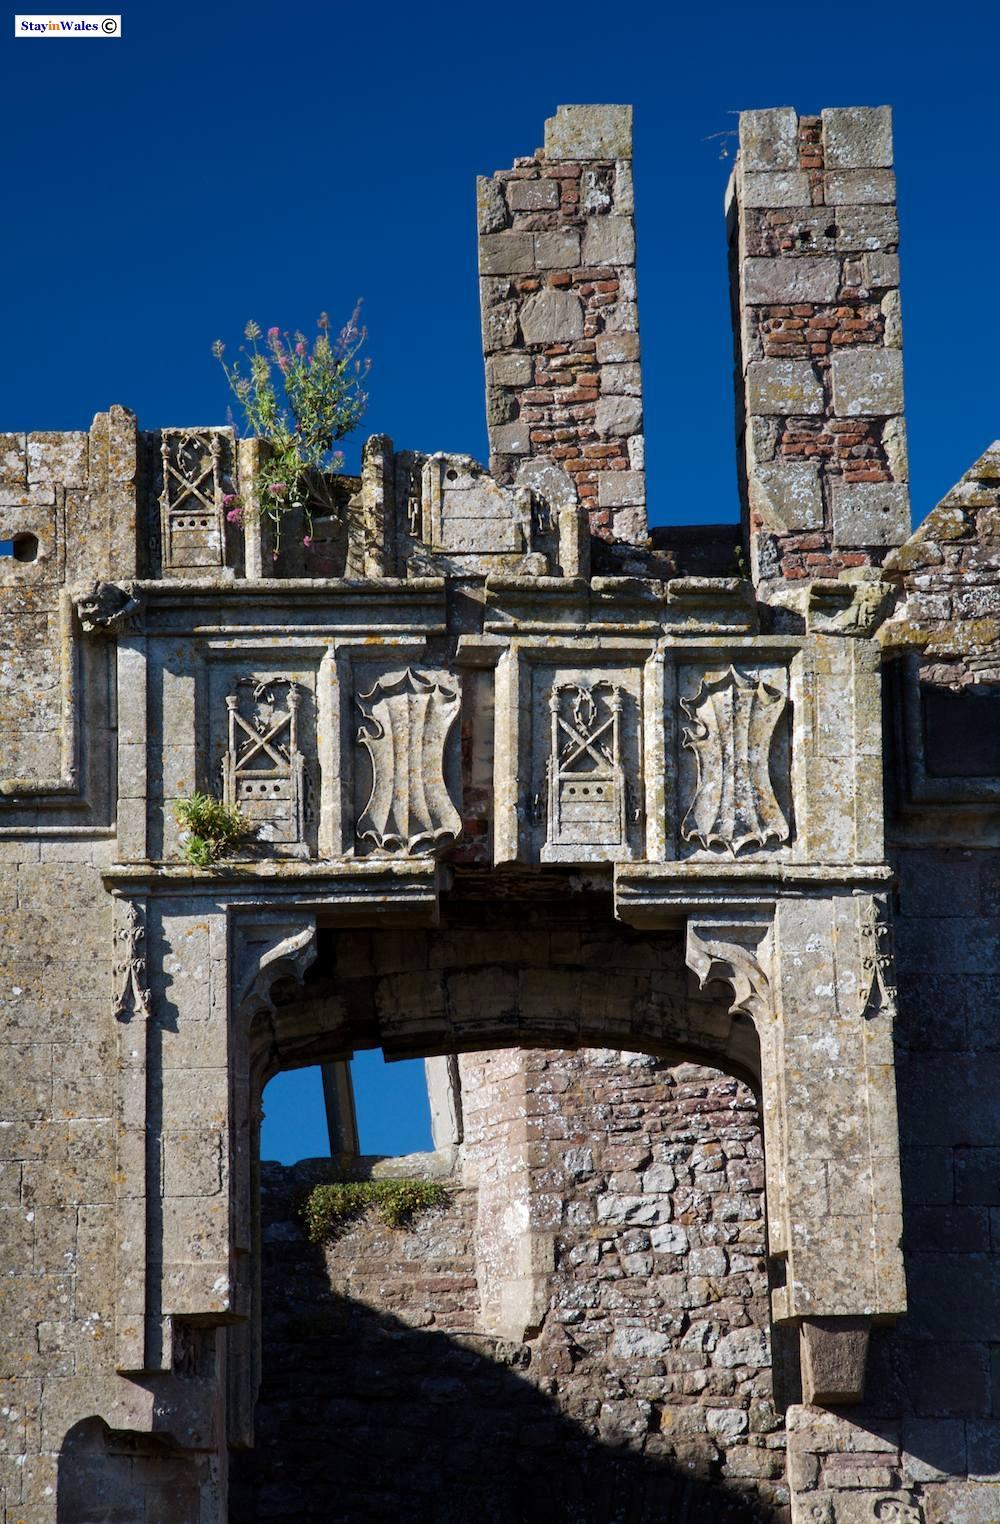 Carved badges and shiled at Raglan Castle